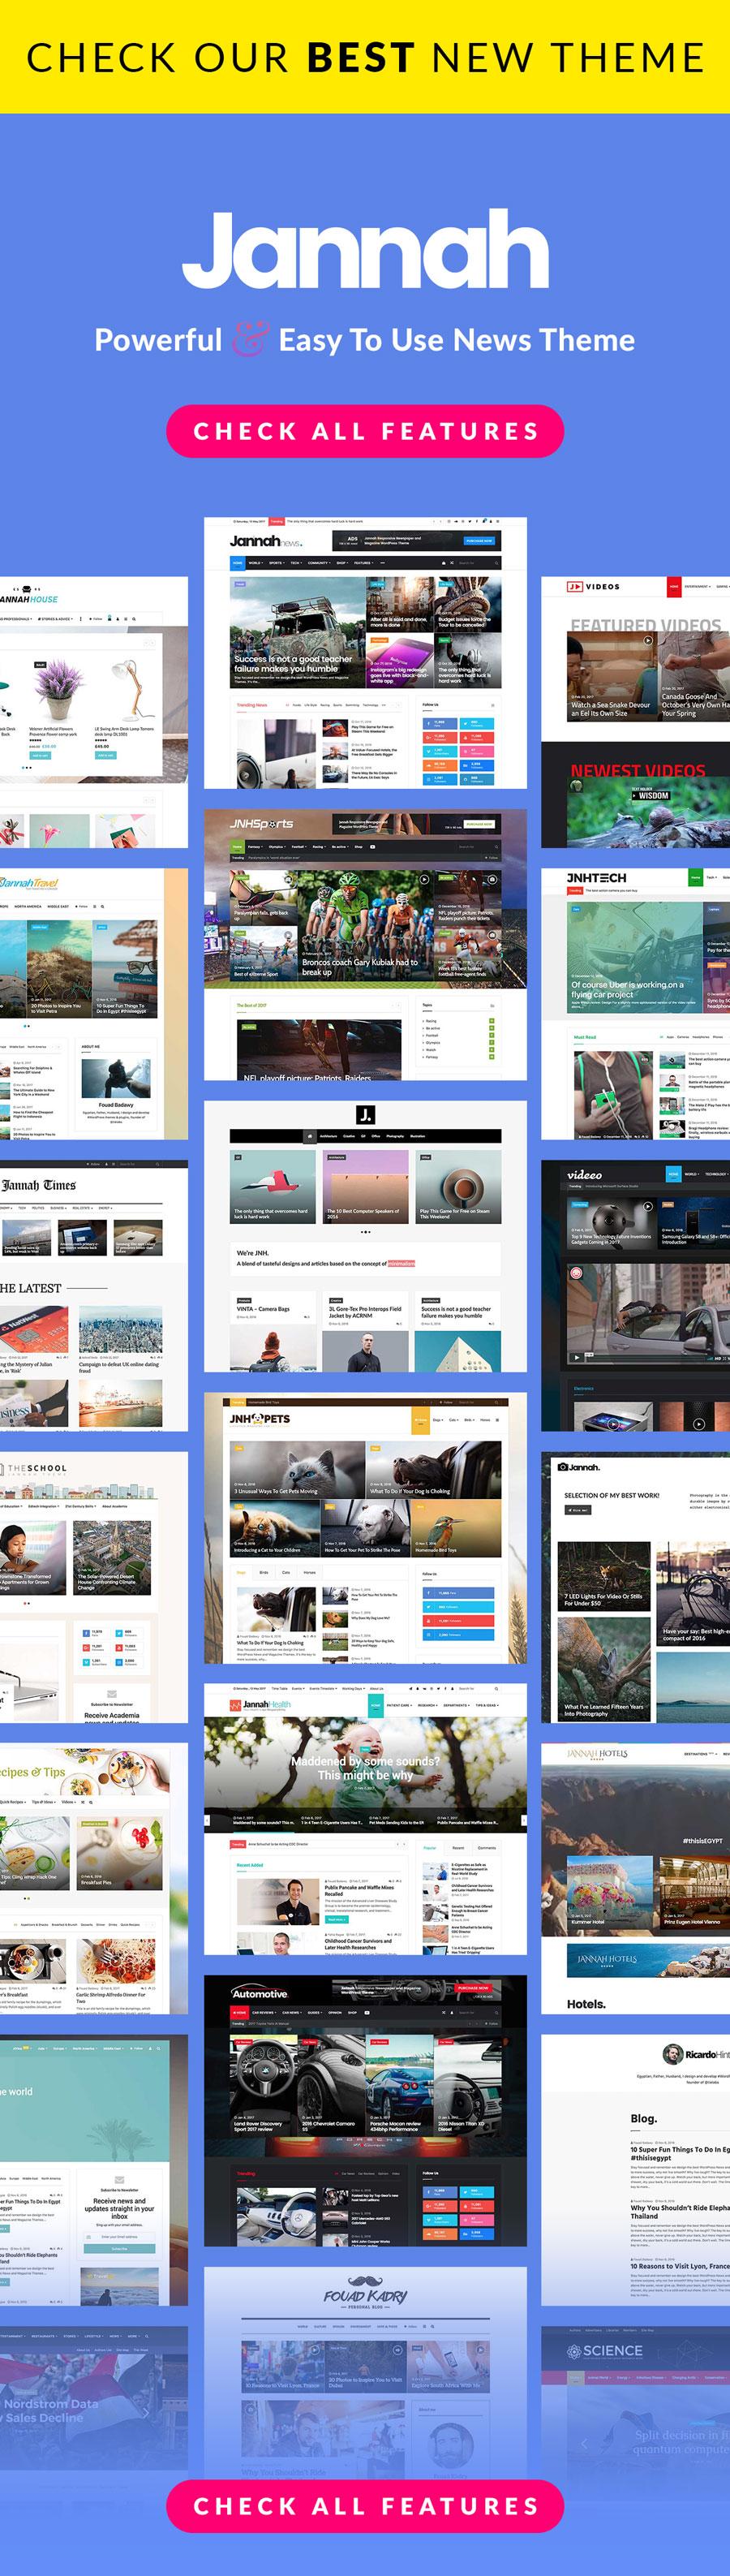 Basata - Retina Responsive WordPress Blog Theme - 1